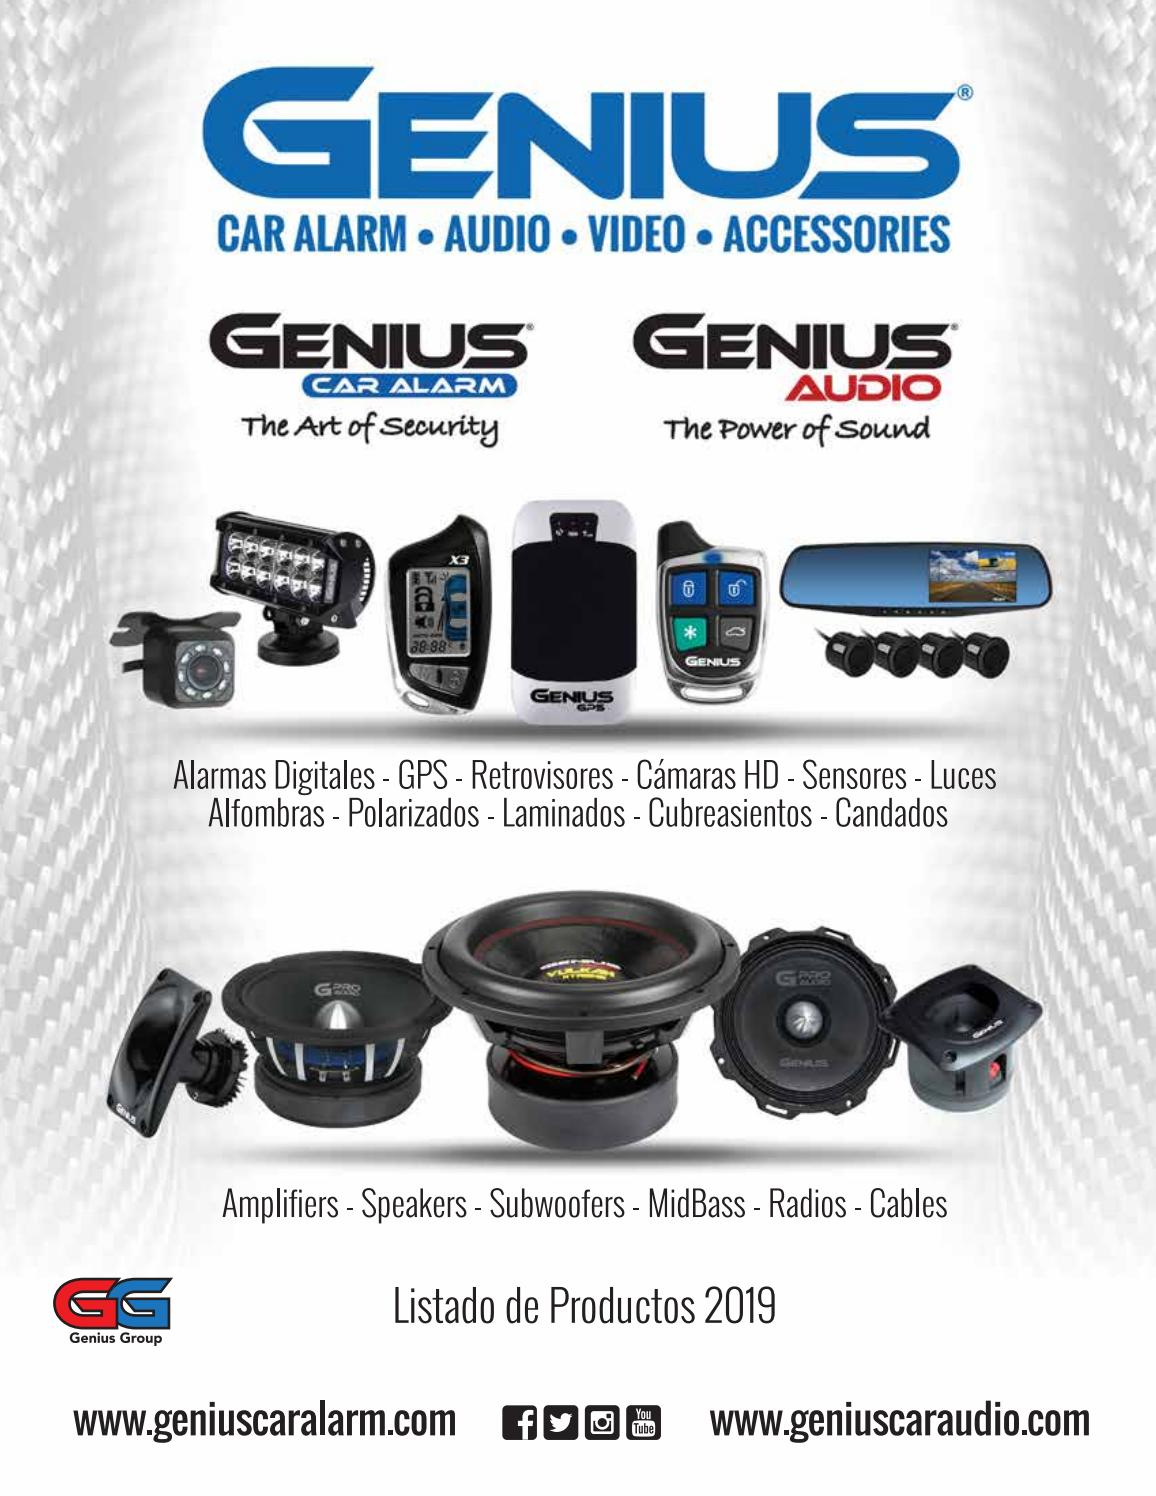 Kit de cables de calibre 4 AWG Cable de graves coche Amp Kit de cableado Car Audio Alta Calidad 2500